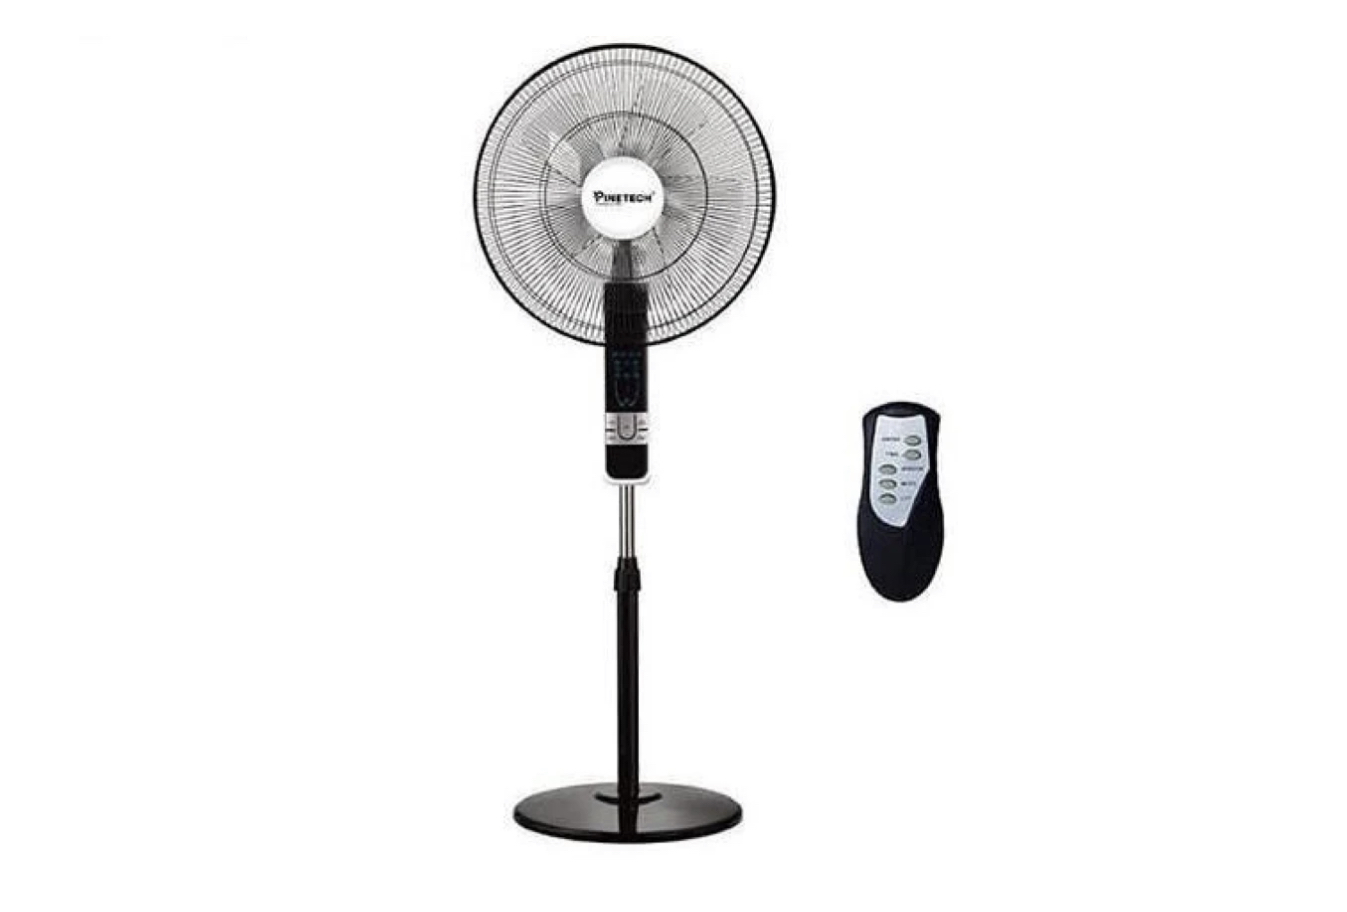 Pinetech Standing Fan 12 Inches  With Remote Tanzania (SF015) | FENI YA PINETECH